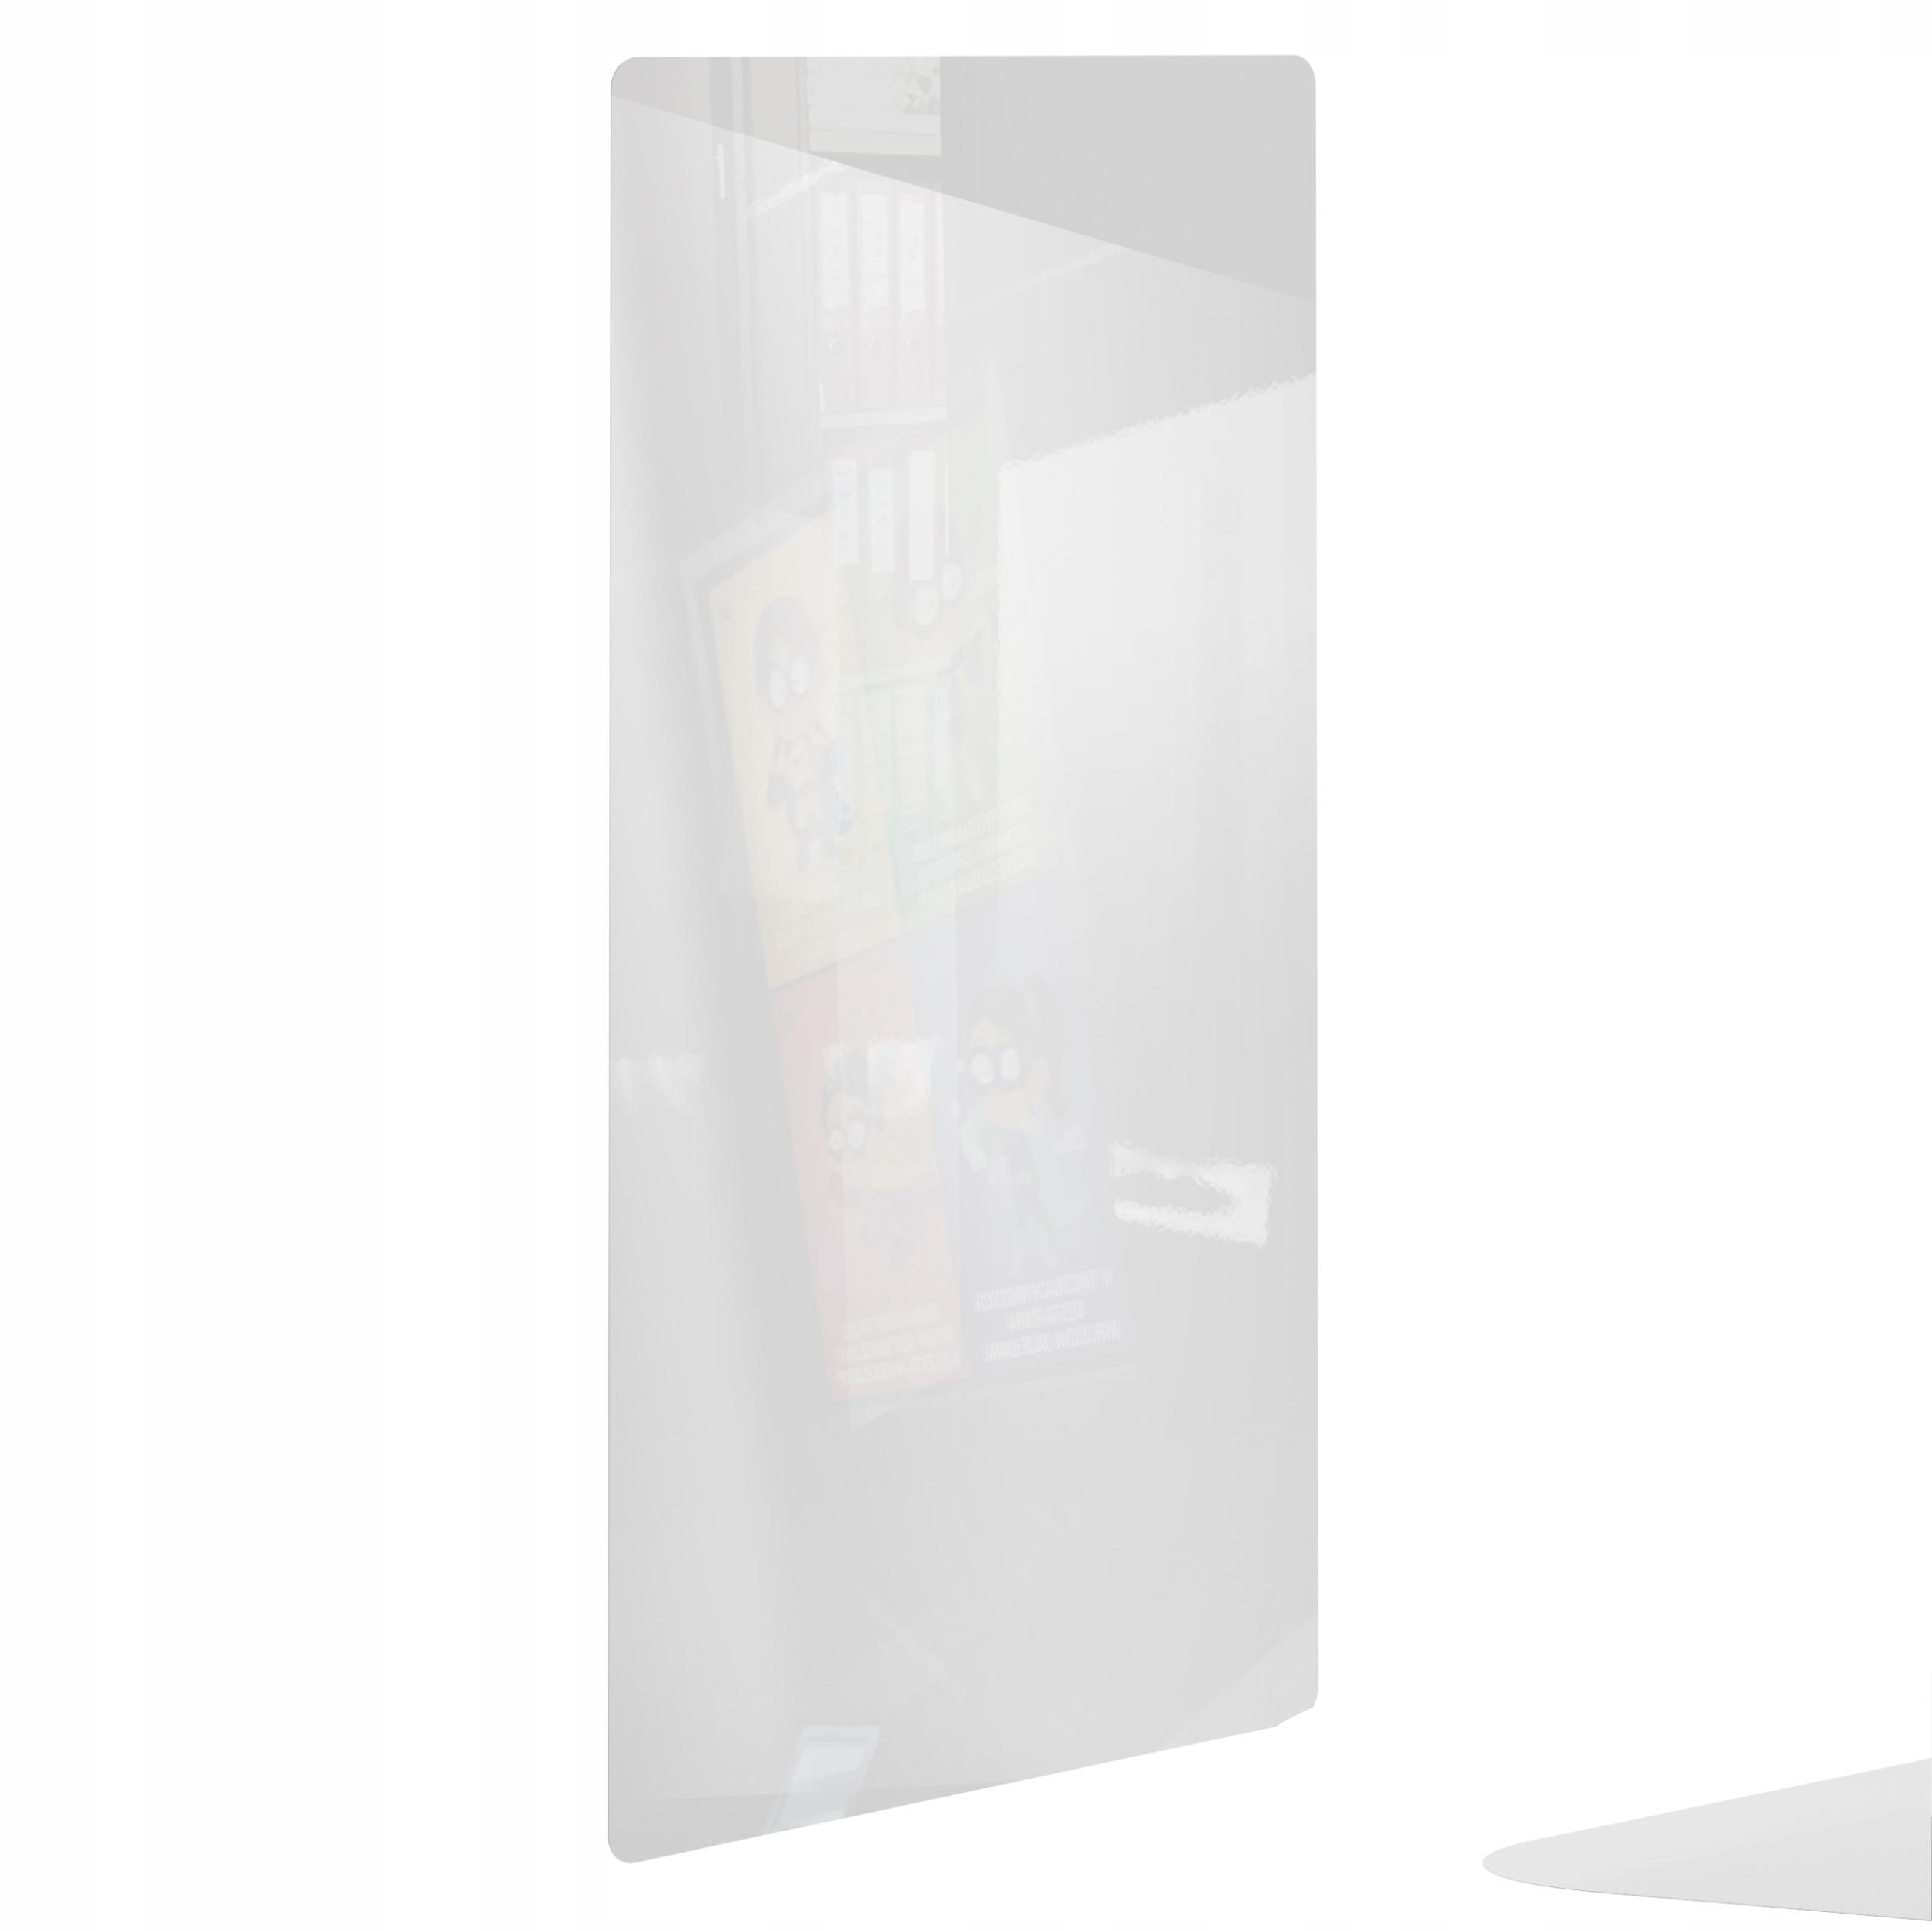 PLEXA PLEXA PLEXI 68x125 см защитный, бесцветный